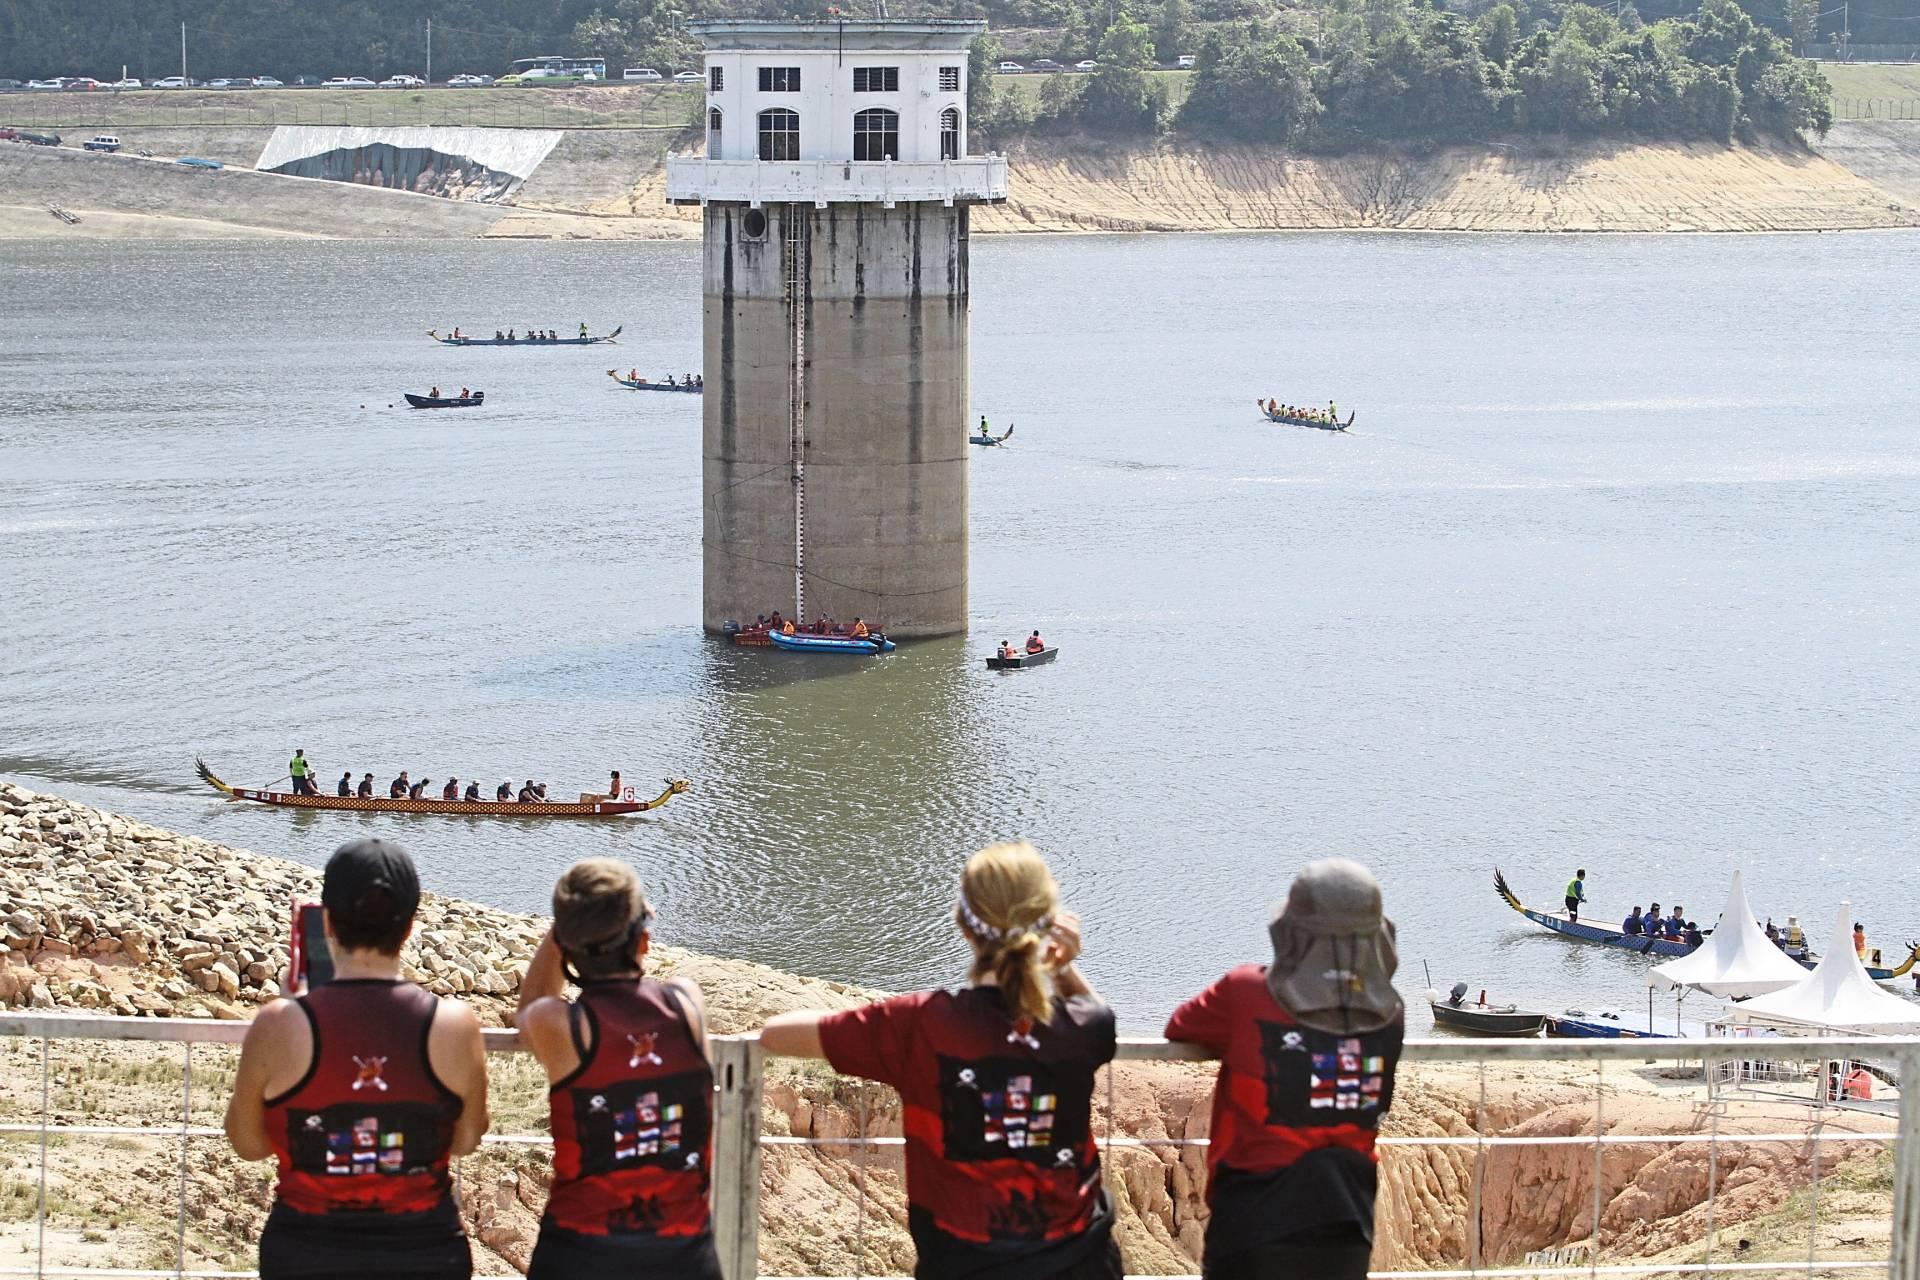 Participants watching the dragon boat races at the Teluk Bahang Dam.